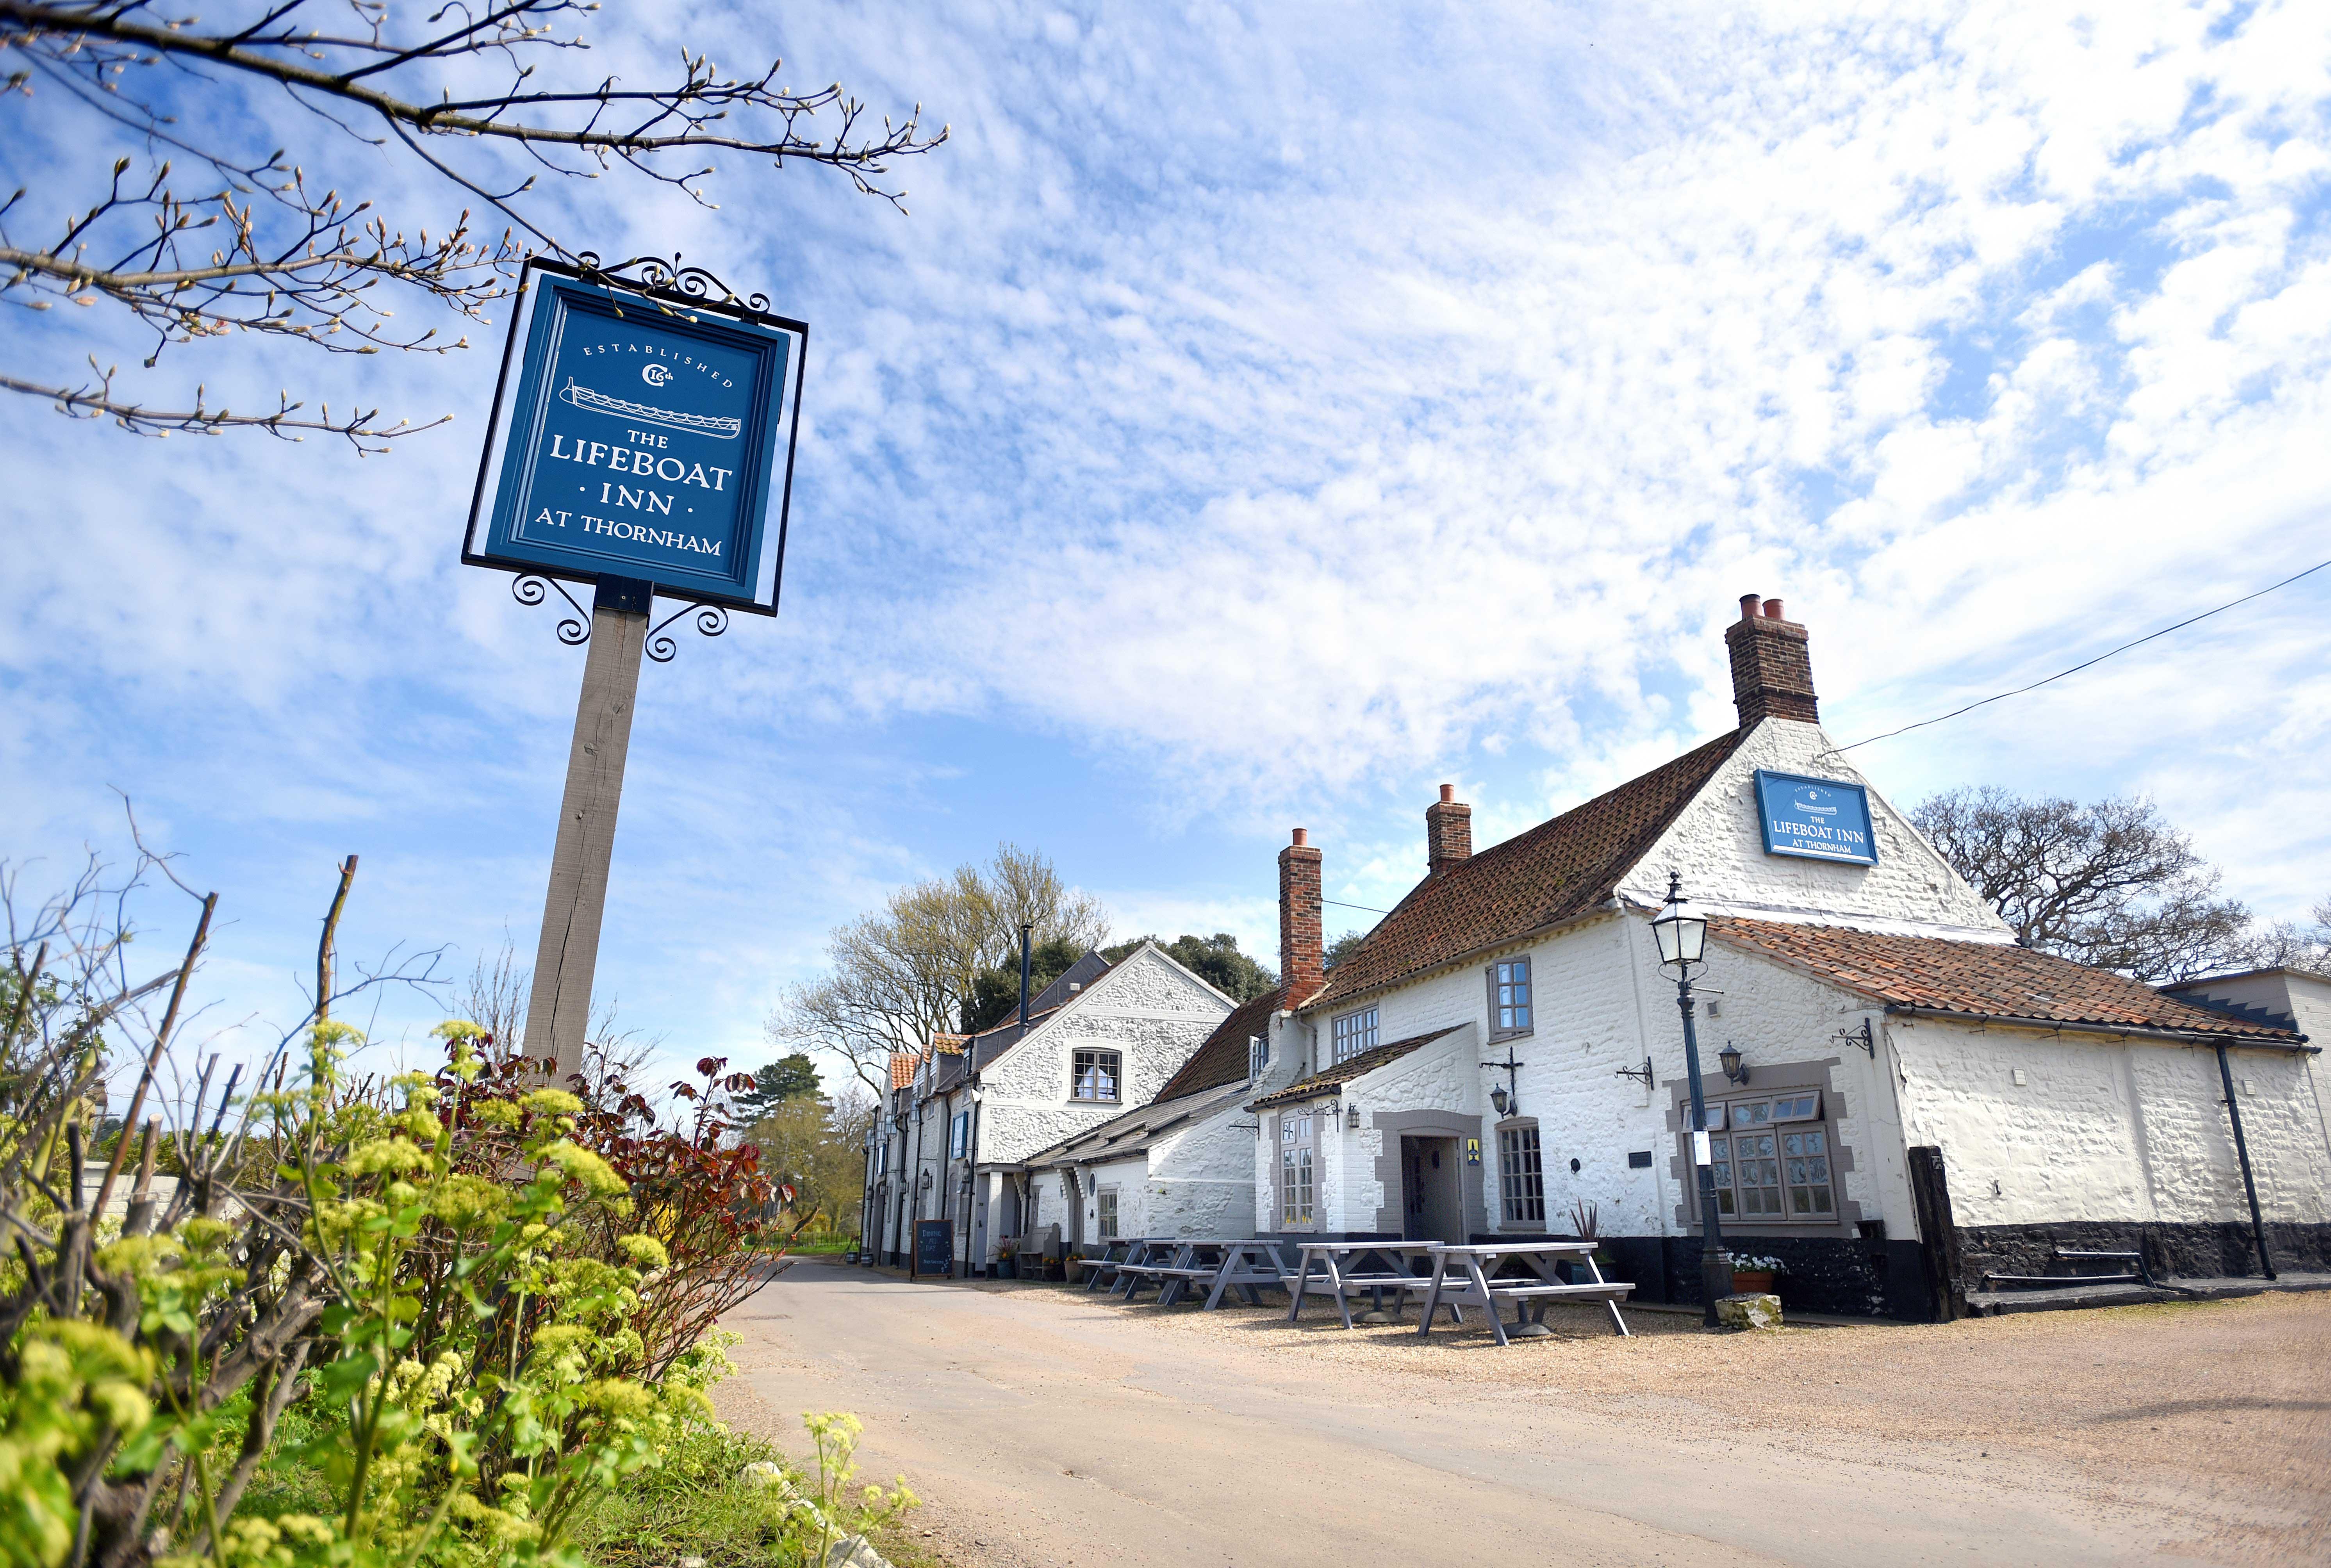 Thornham Lifeboat Inn Hotel